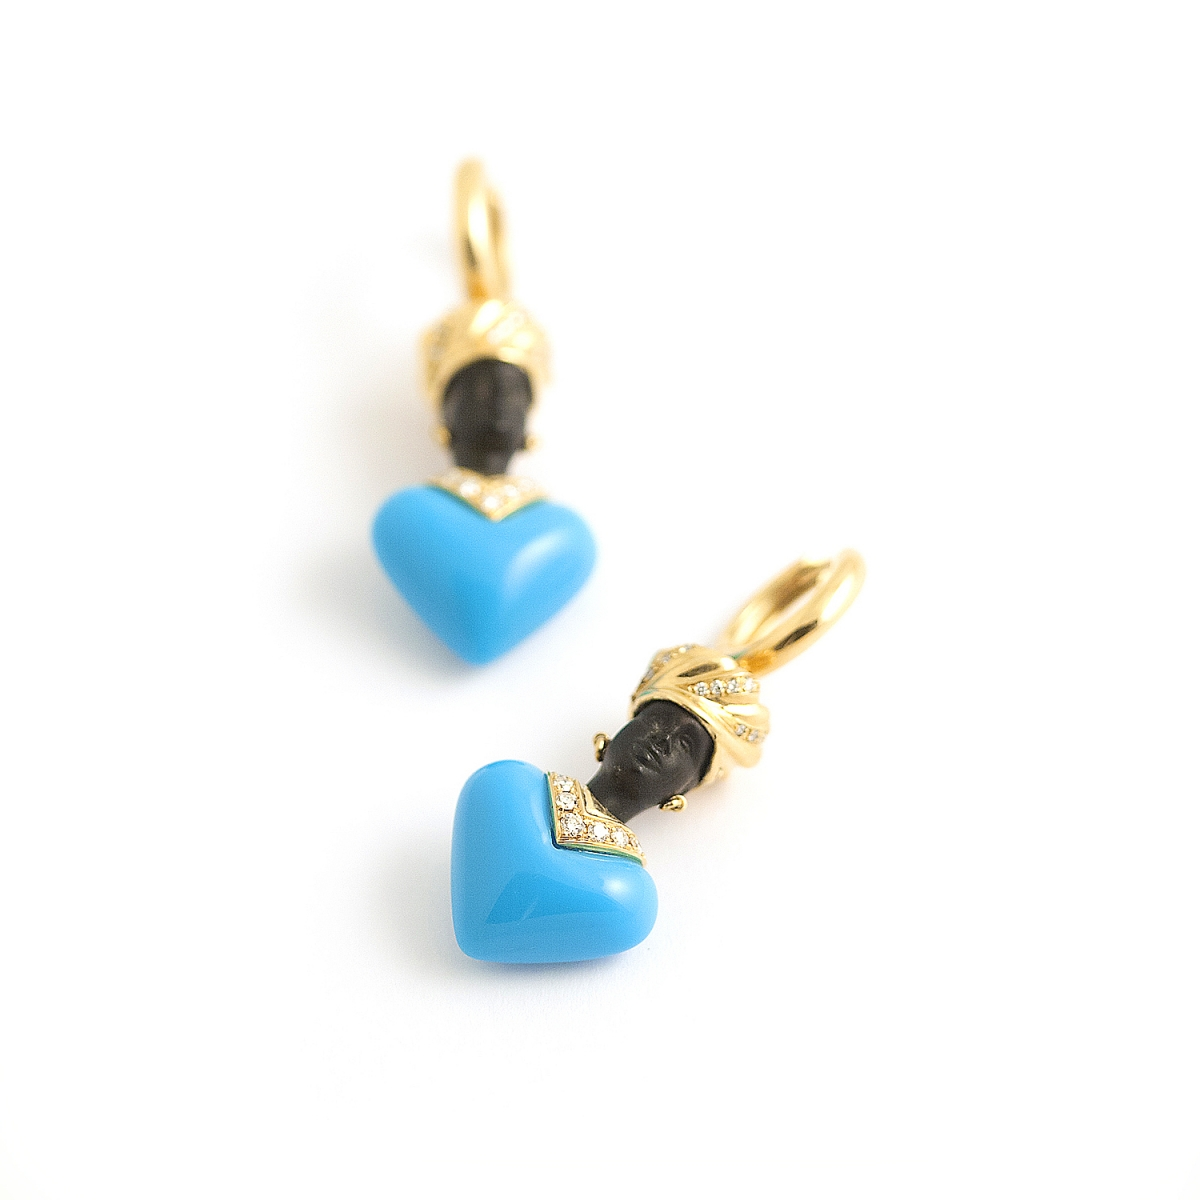 Amoretti earrings